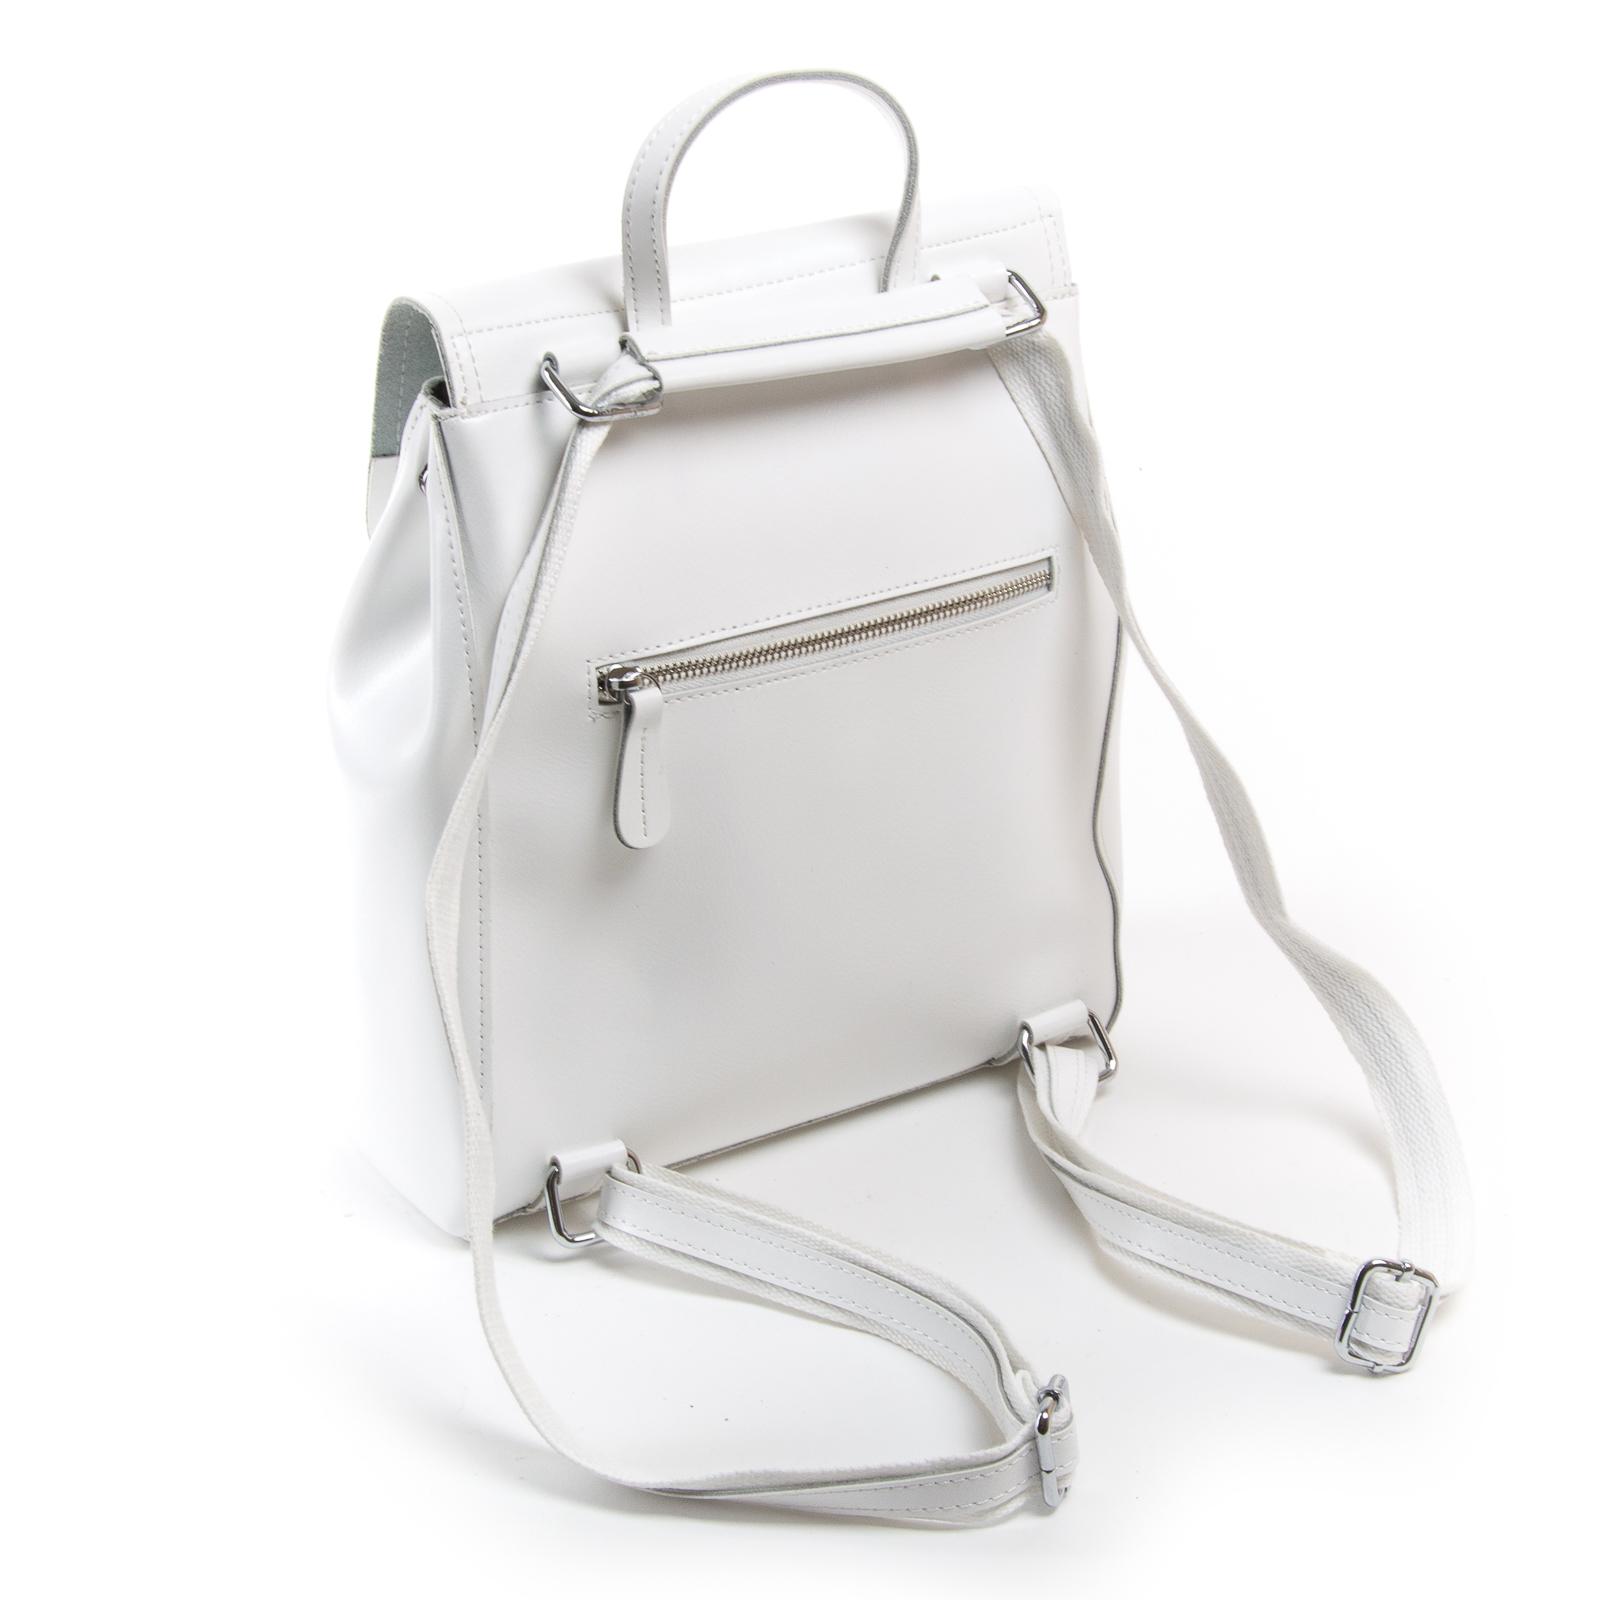 Сумка Женская Рюкзак кожа ALEX RAI 03-01 1005 white - фото 4